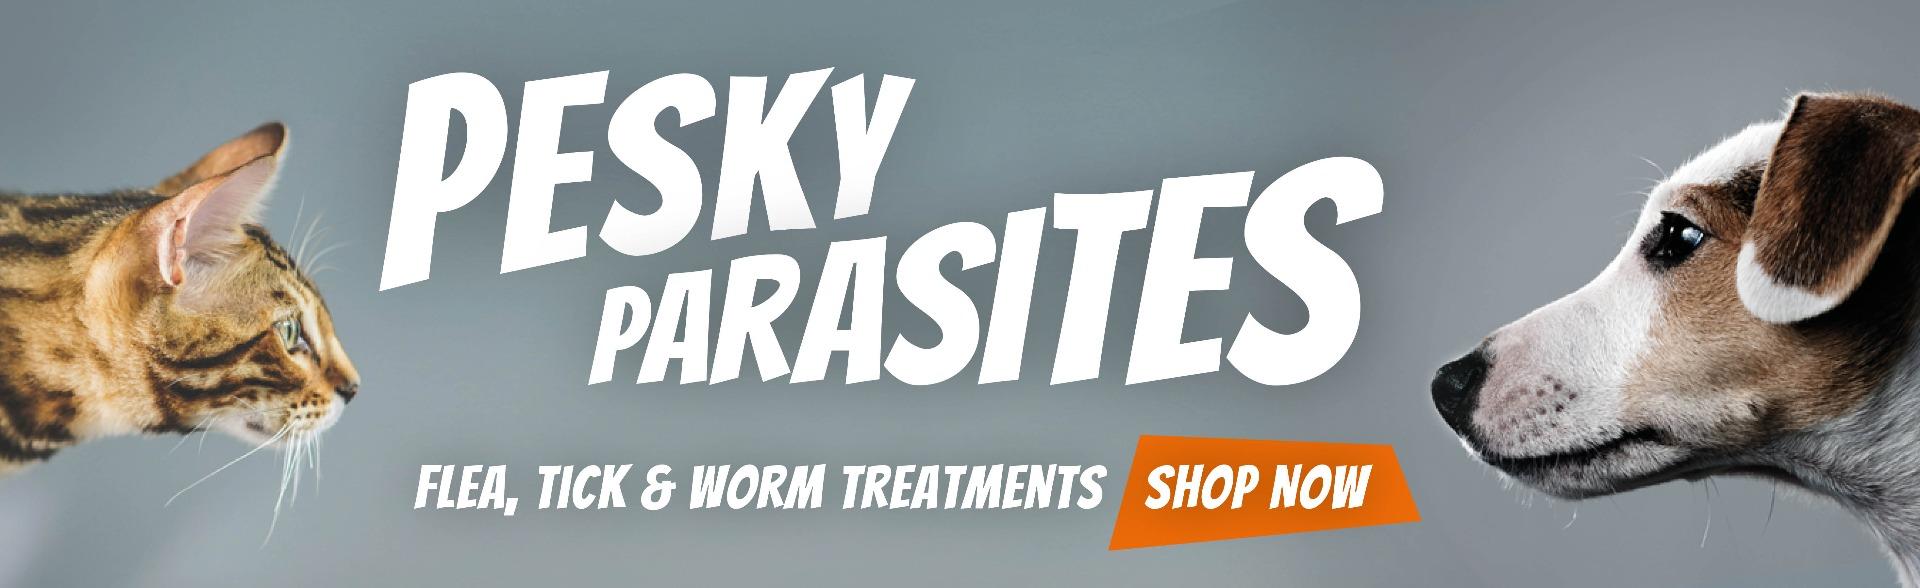 The flea, tick and worm treatment you need